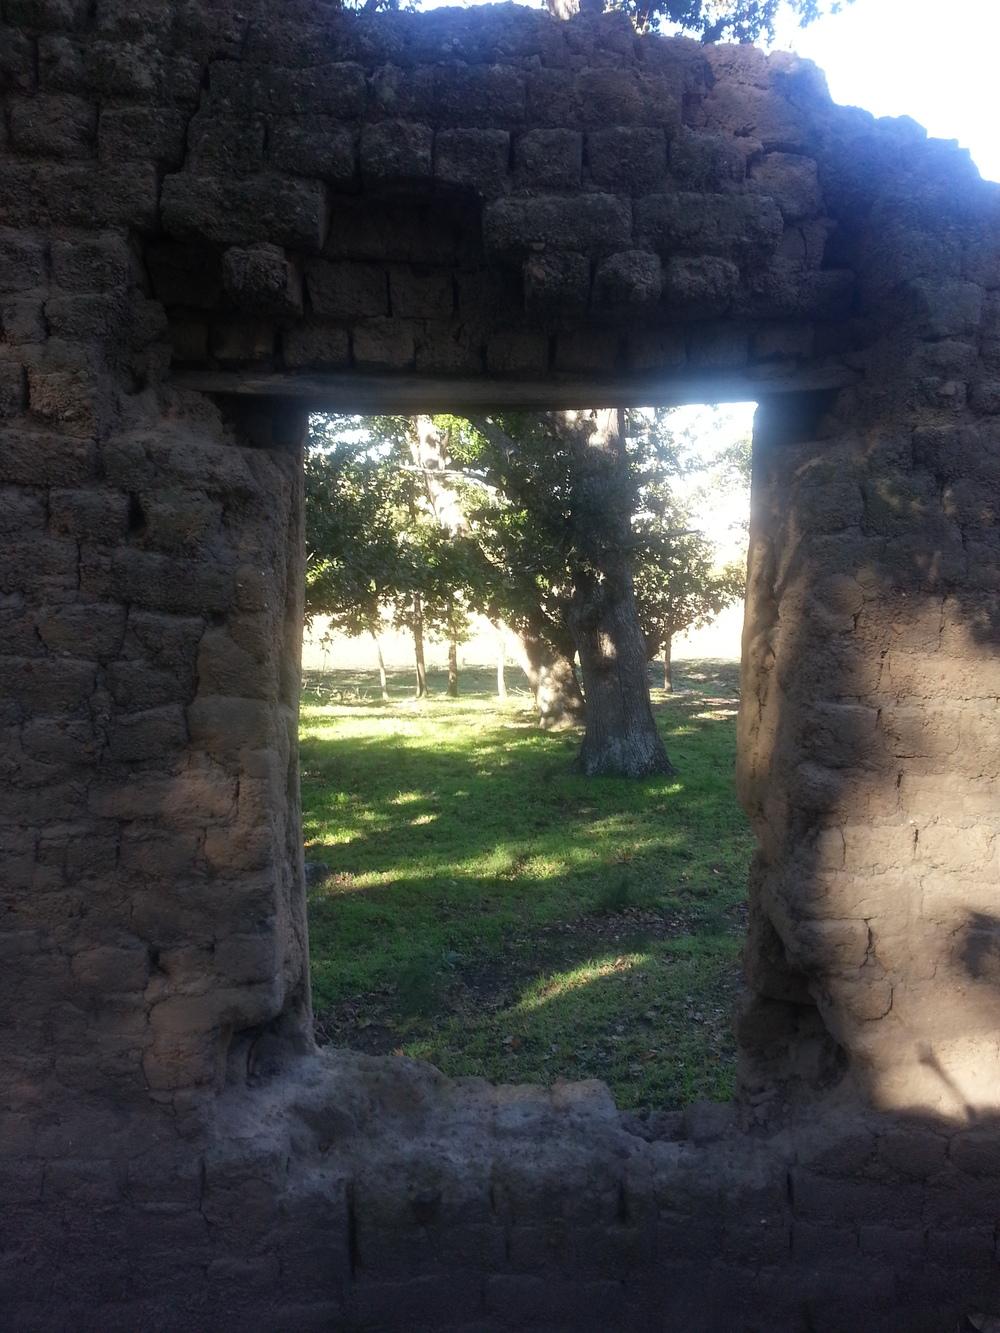 View through the ruin.